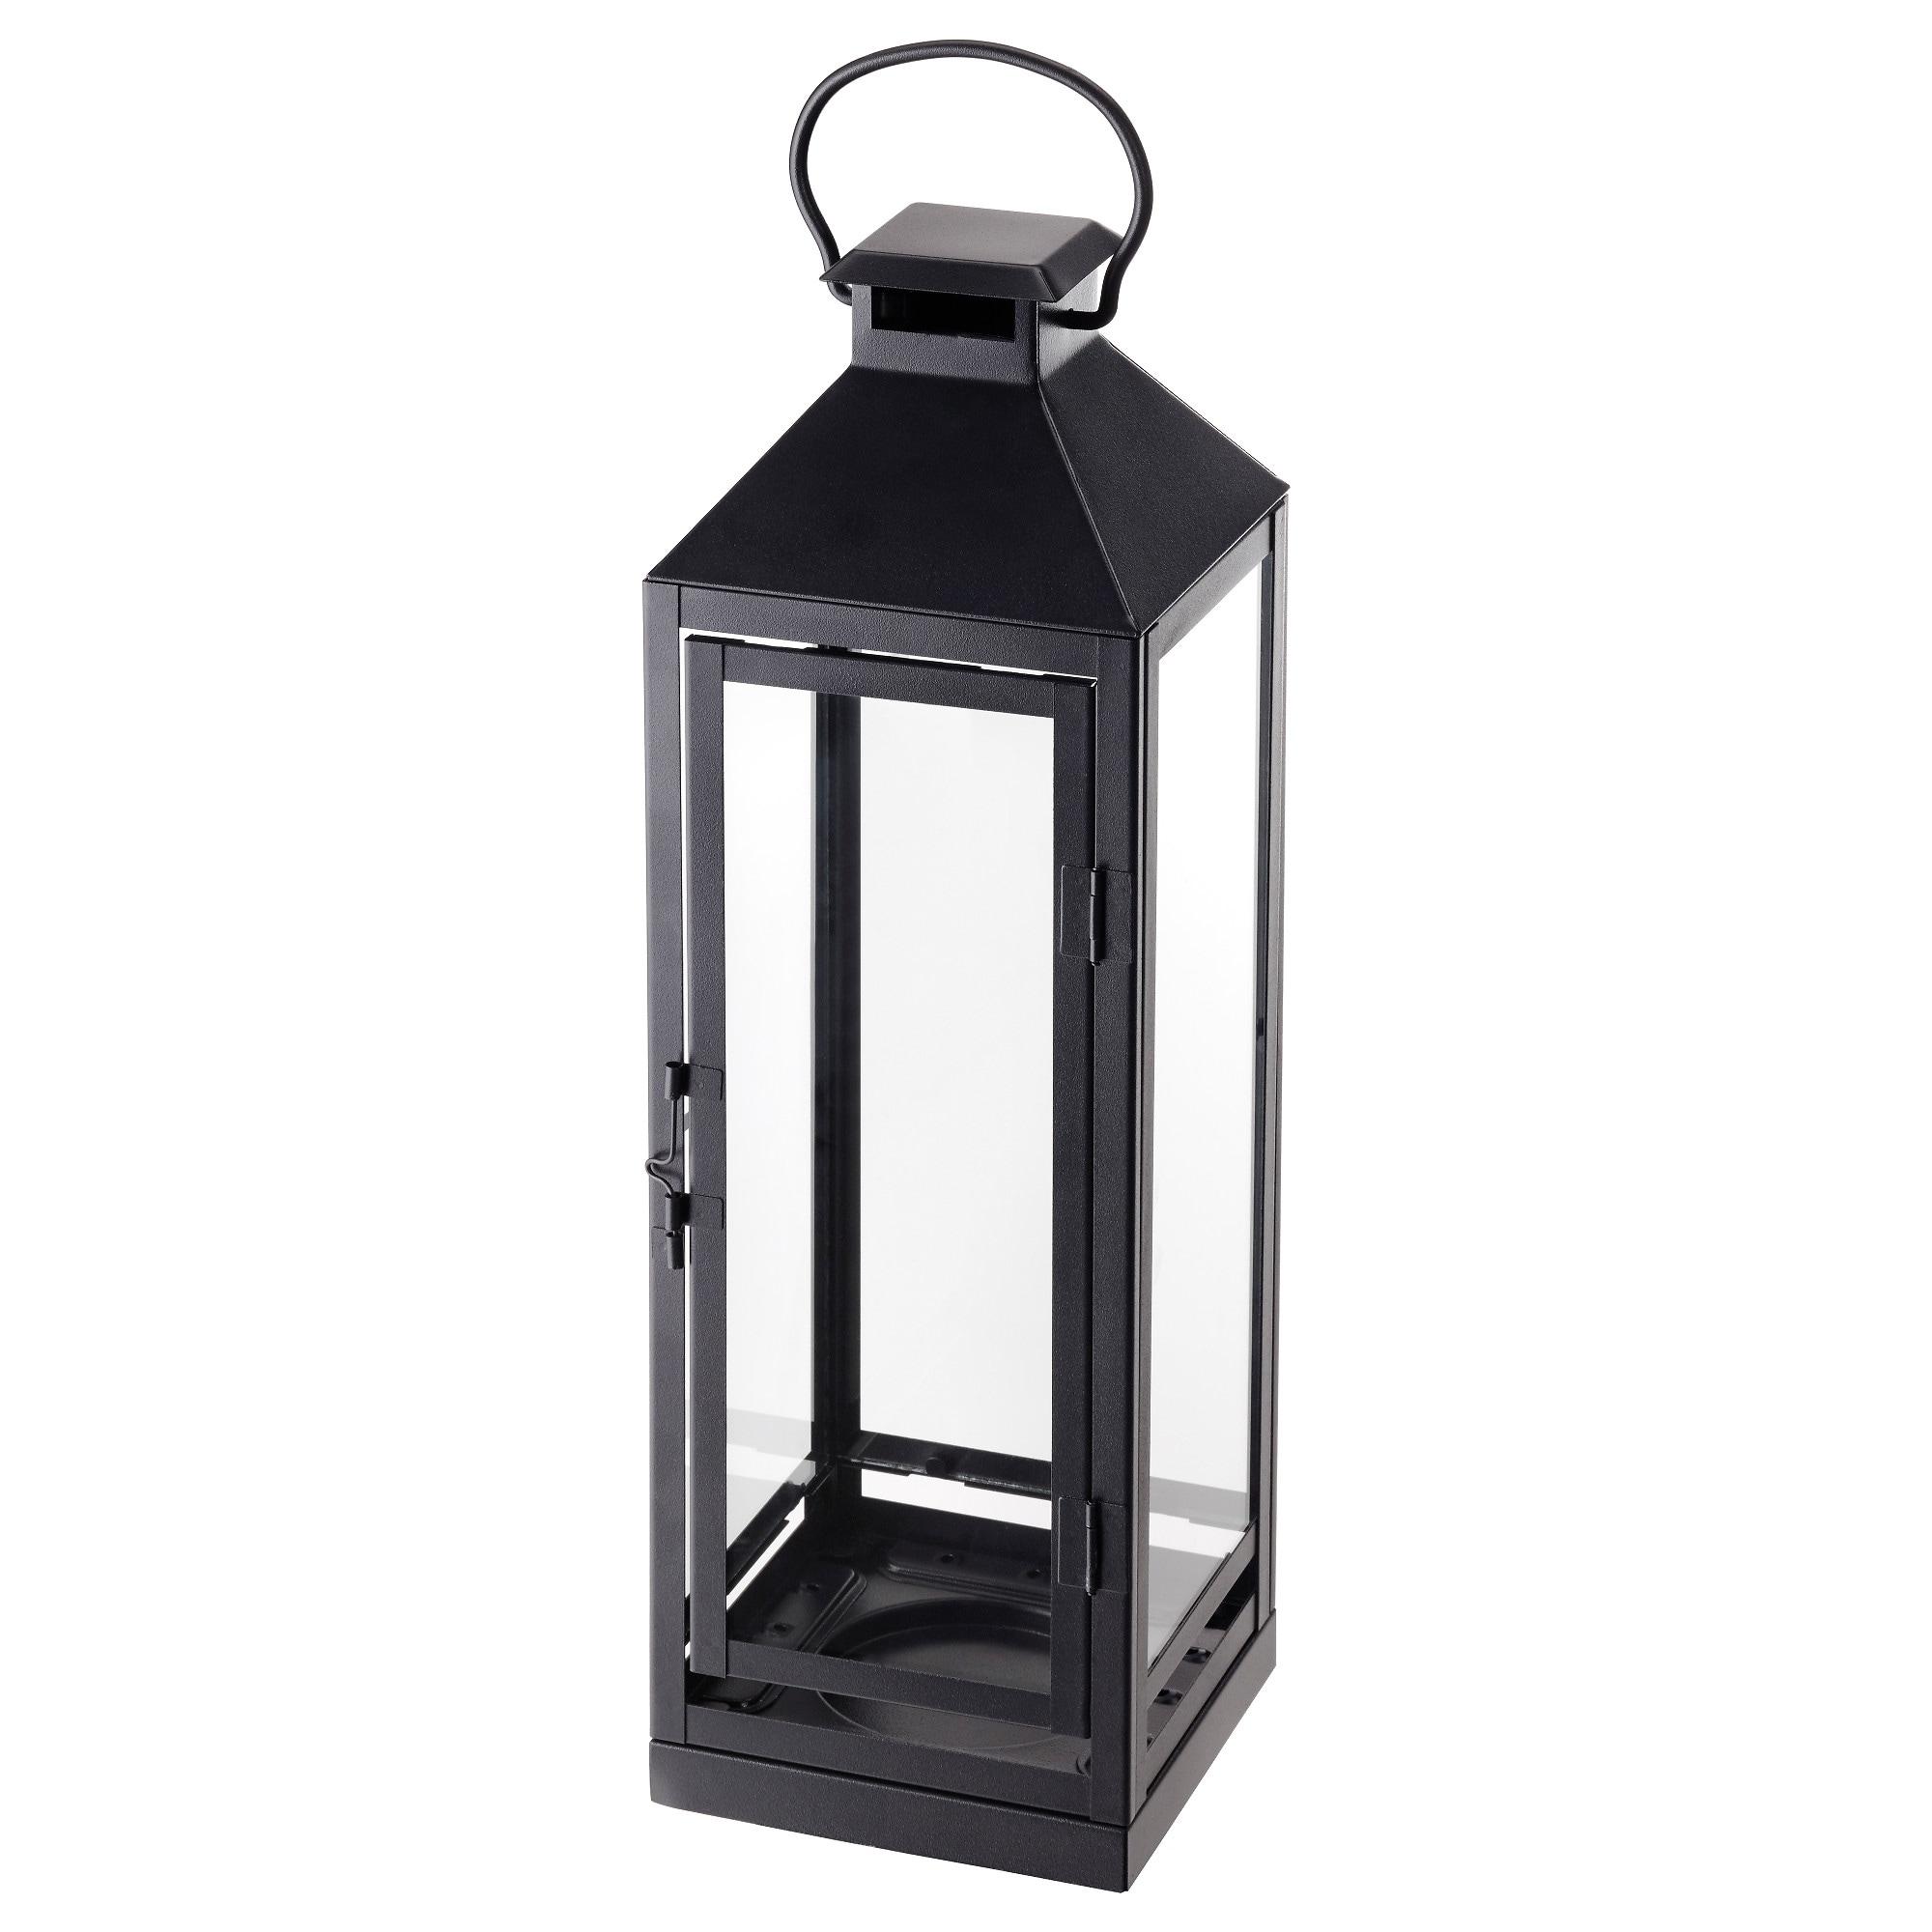 Lanterns & Candle Lanterns - Ikea for Outdoor Empty Lanterns (Image 7 of 20)